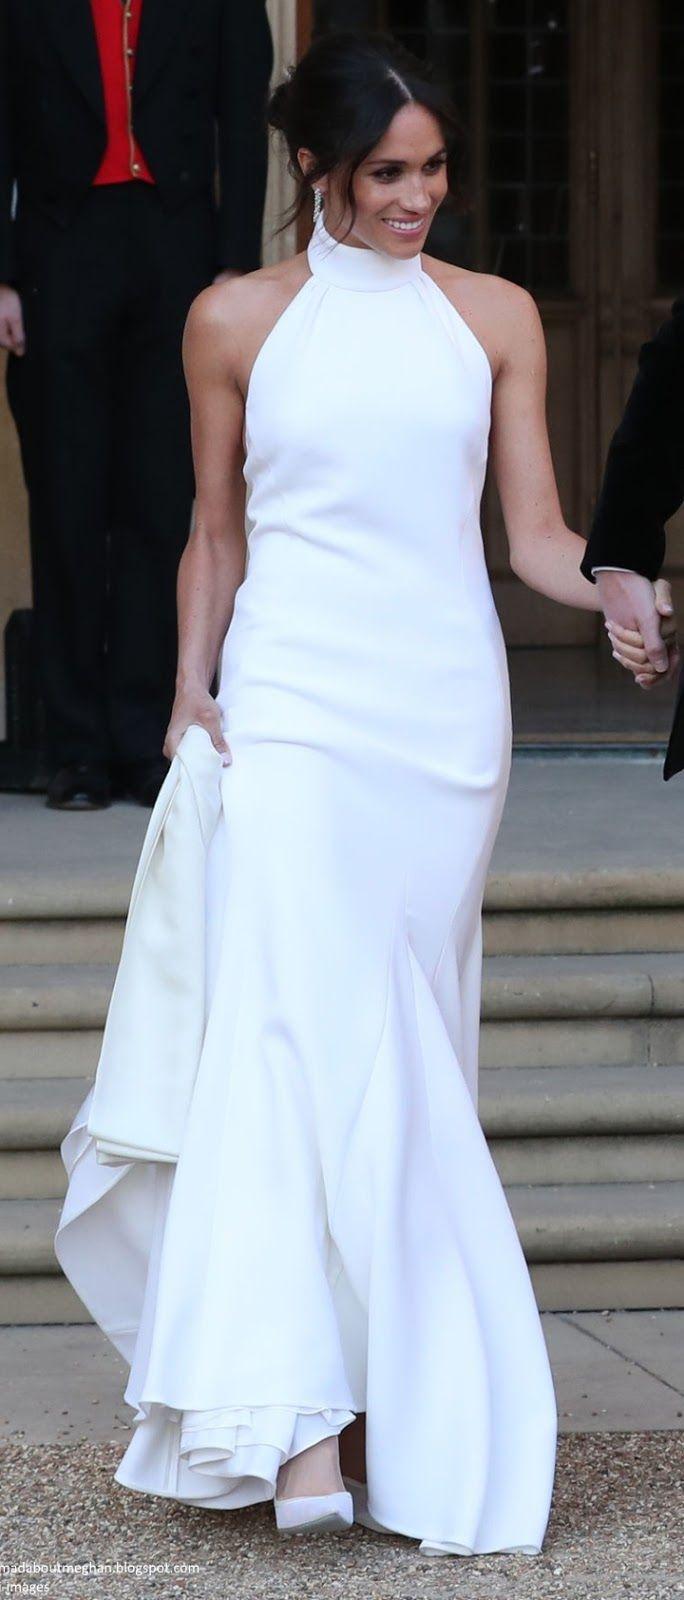 A Magical Windsor Wedding For Harry And Meghan Vestidos De Novia Vestidos Largos Vestidos [ 1600 x 684 Pixel ]